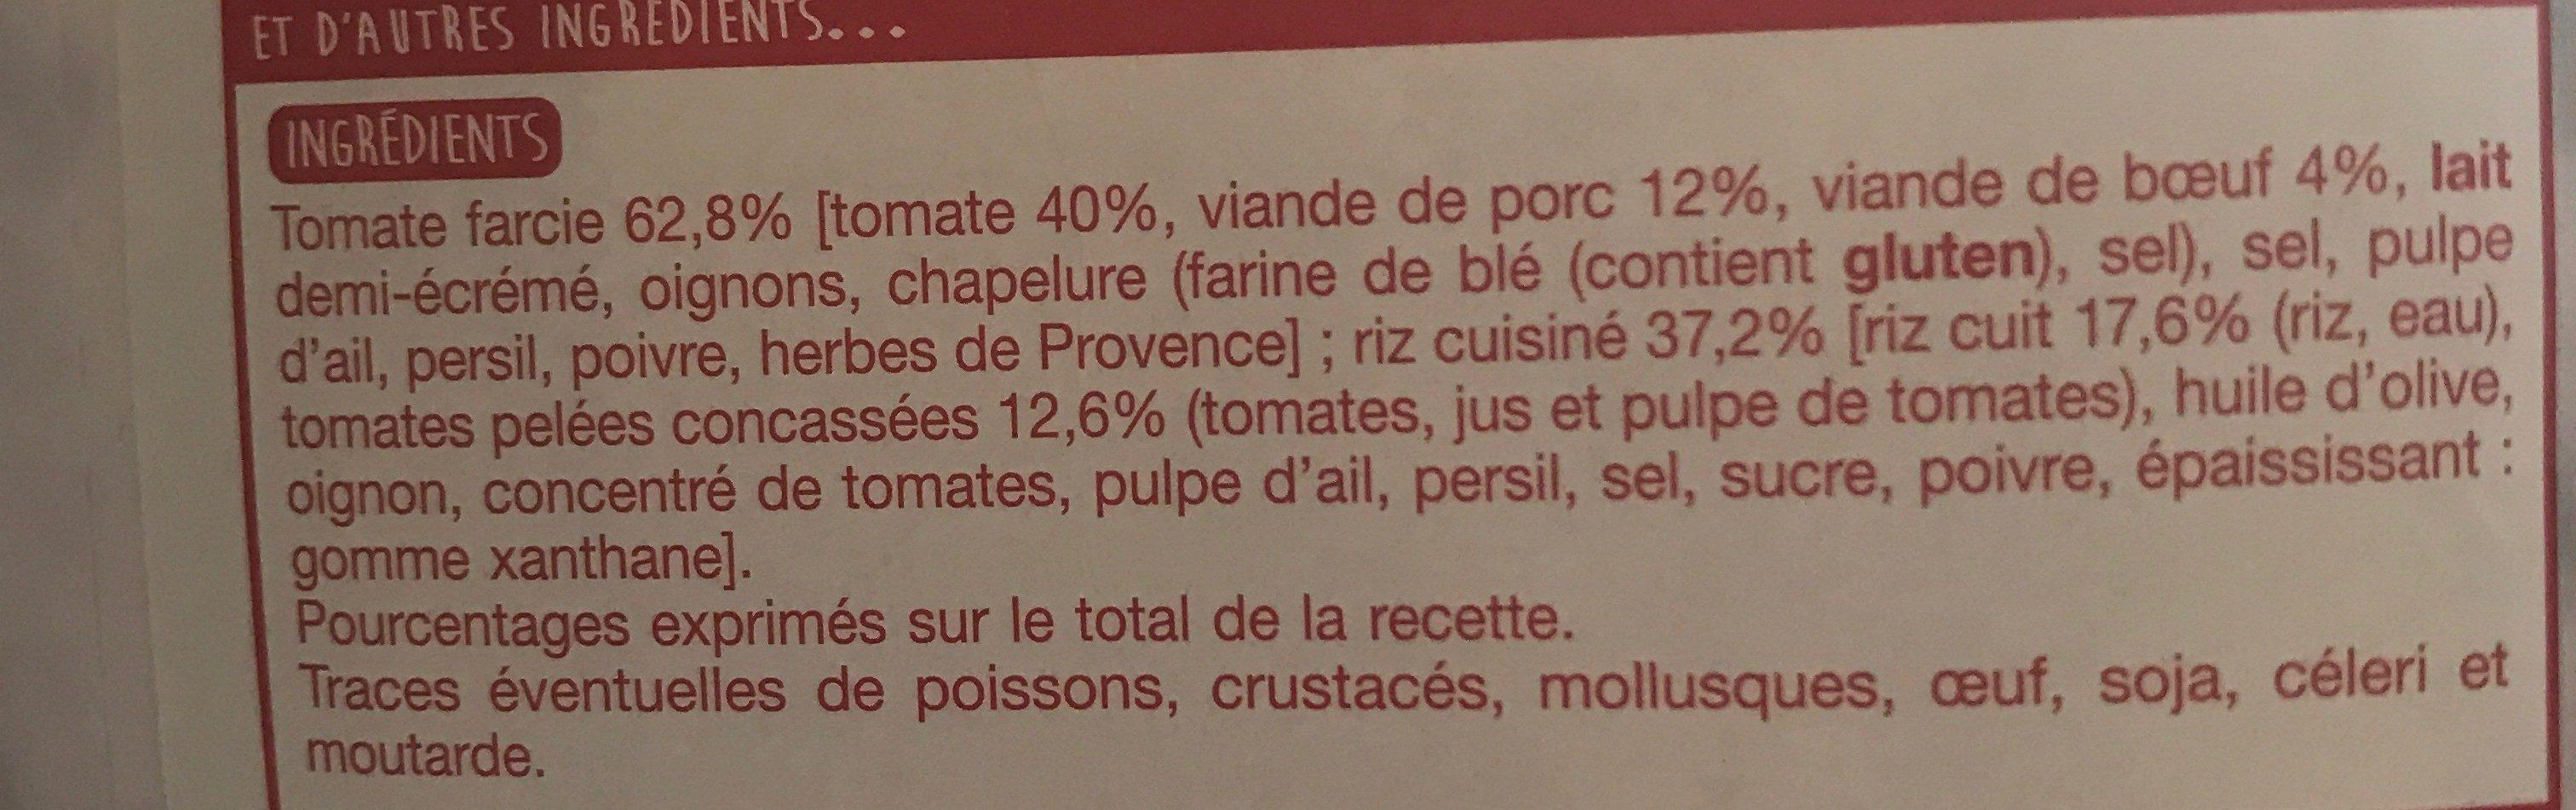 Tomates farcies et leur riz cuisiné - Ingrediënten